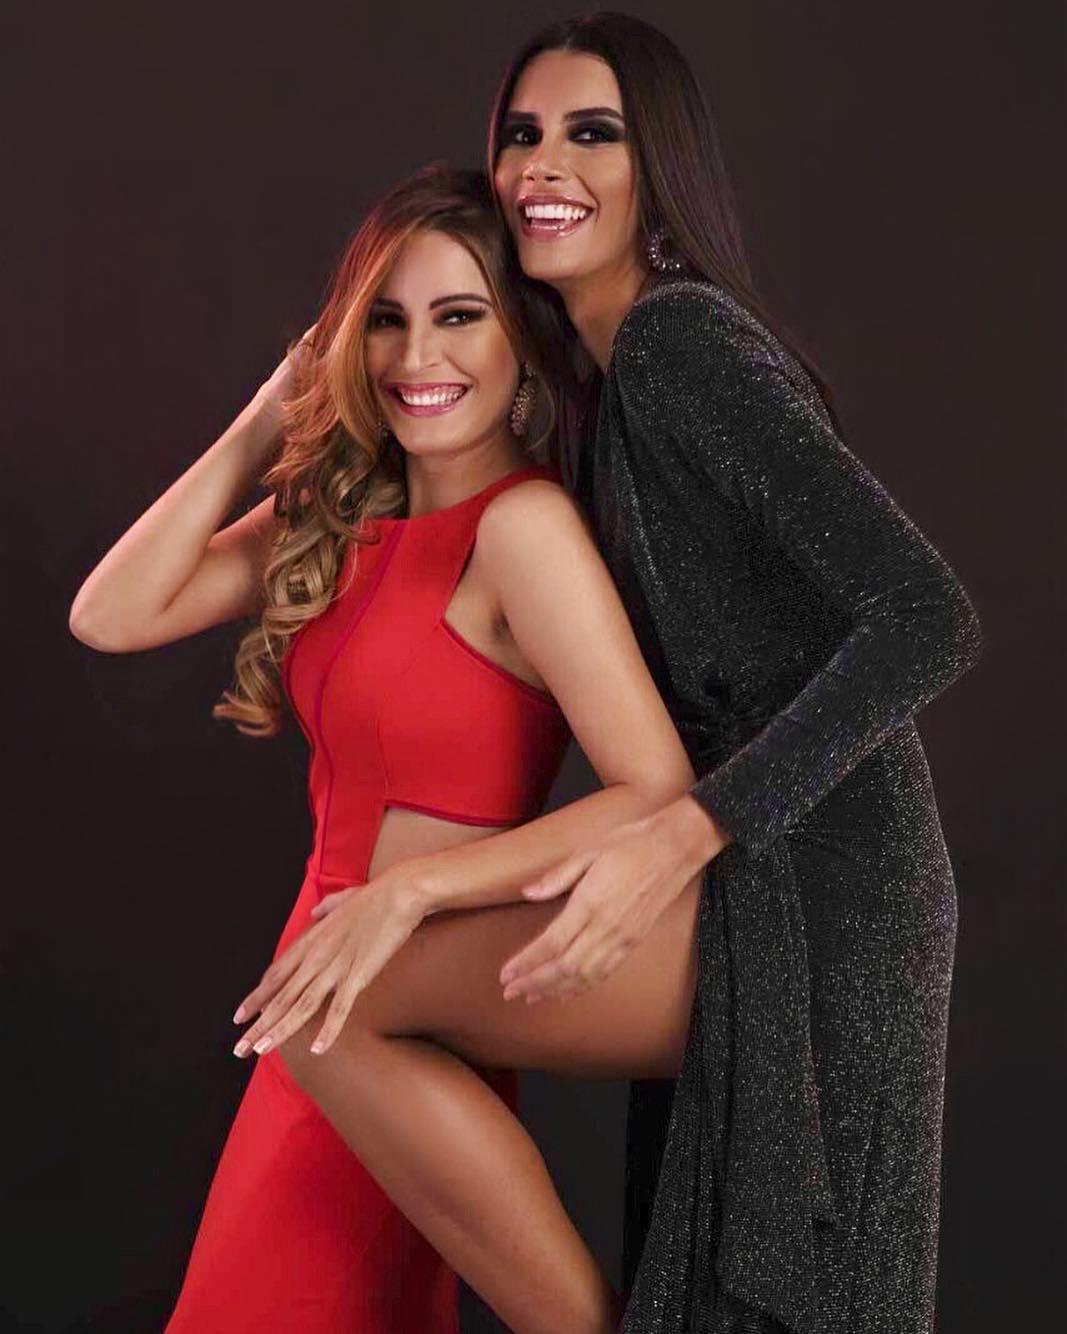 jessica carvalho, miss brasil mundo 2018. 32910810